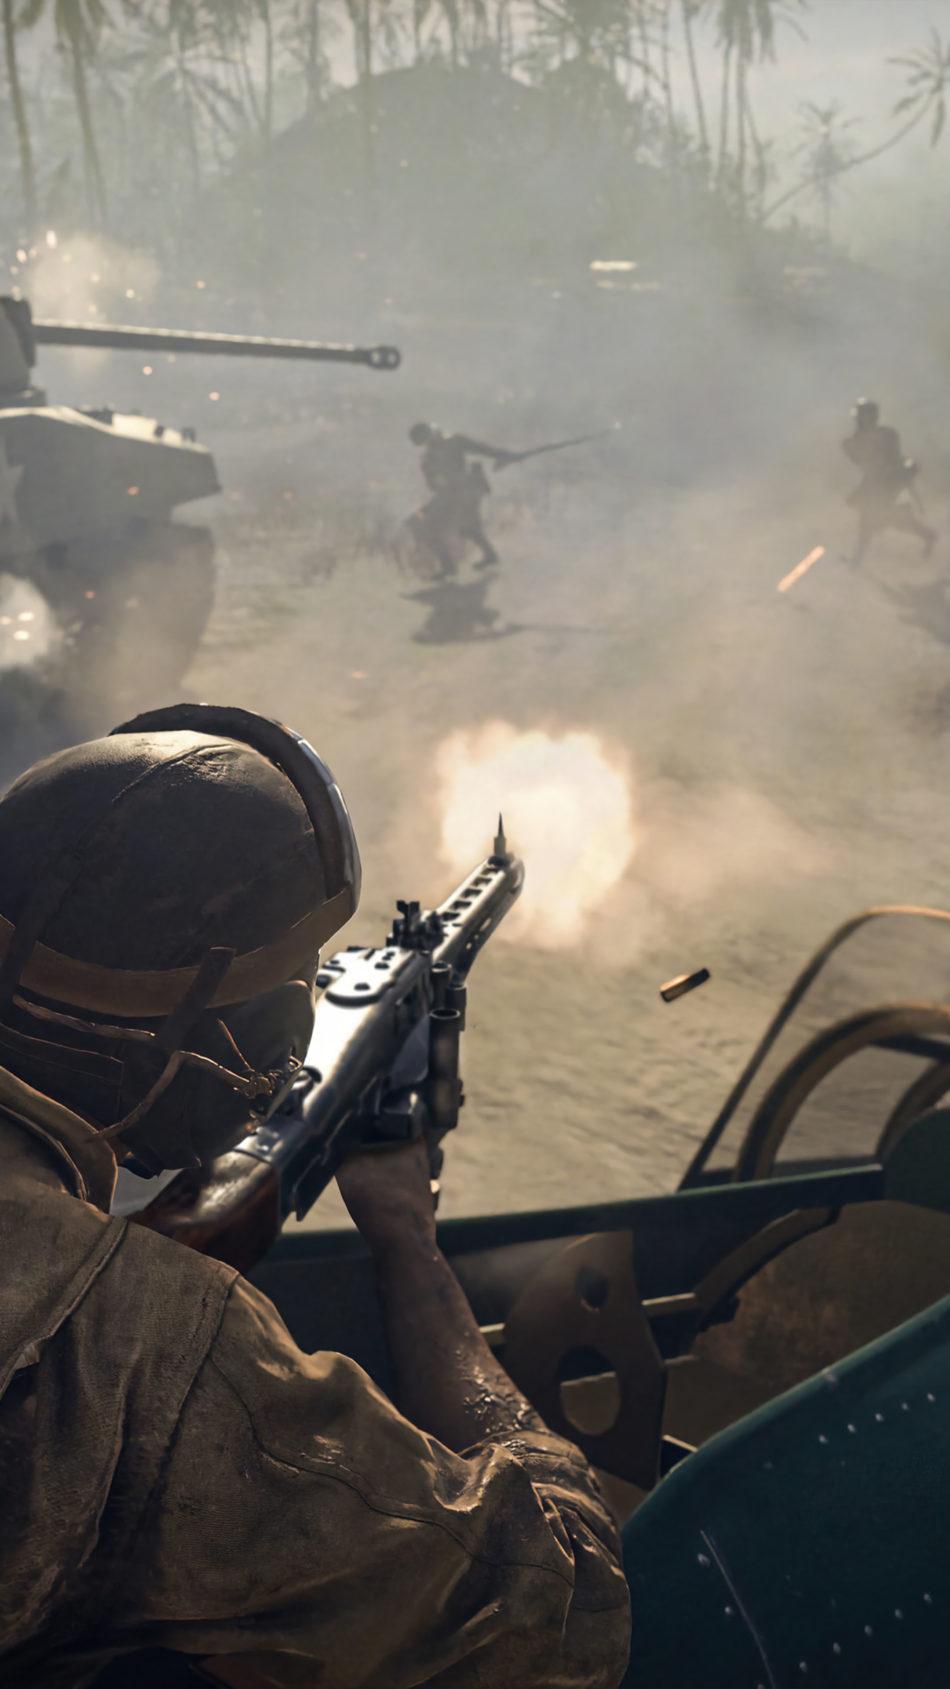 Call of Duty Vanguard Gameplay 4K Ultra HD Mobile Wallpaper